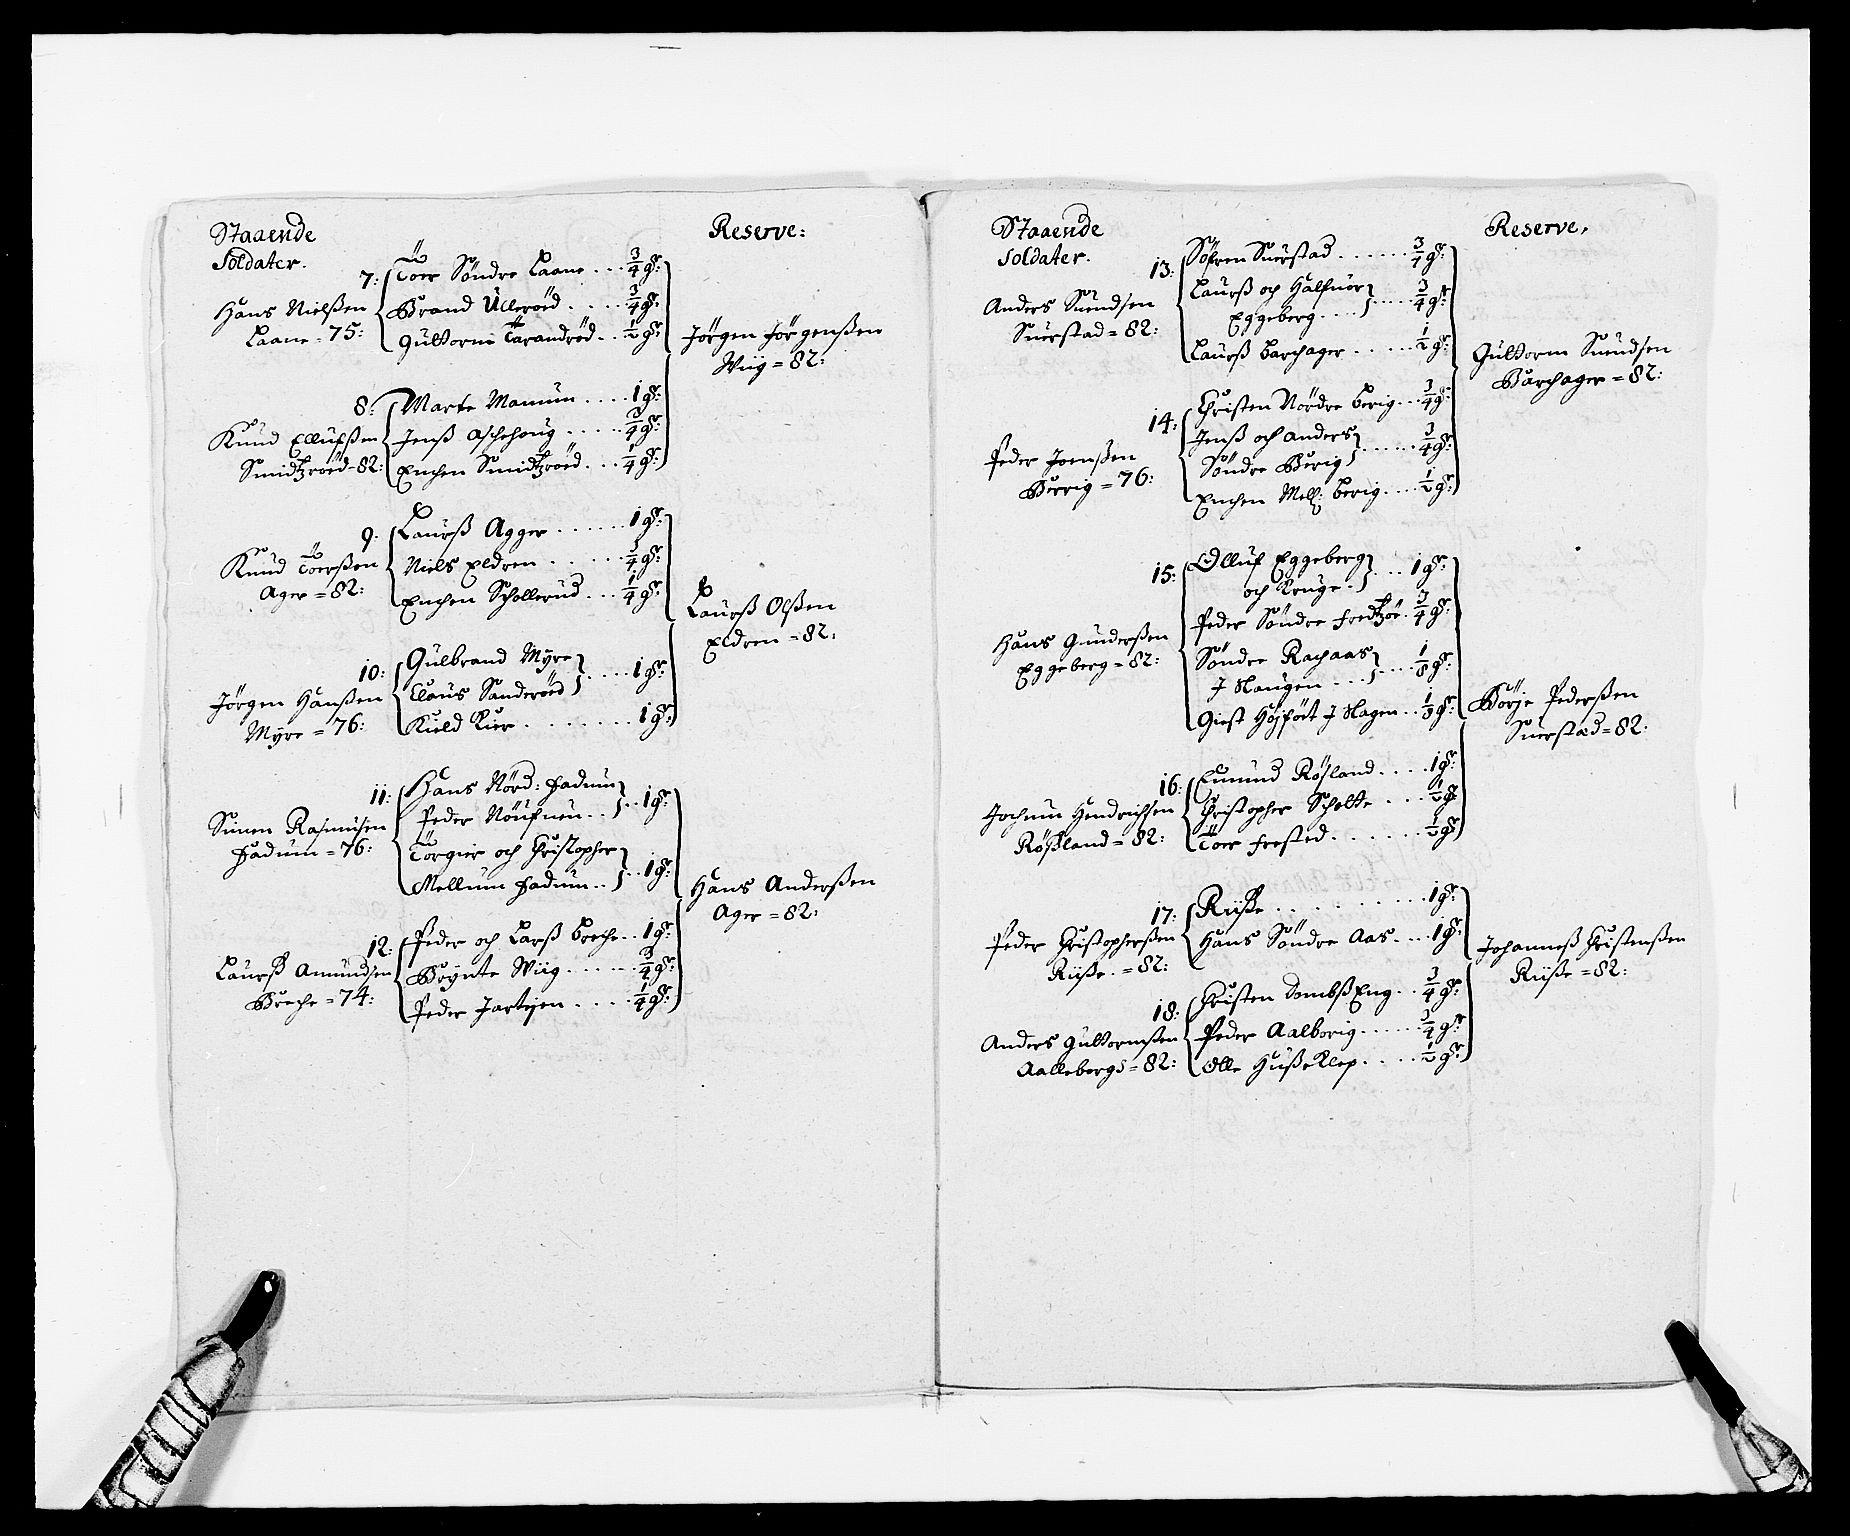 RA, Rentekammeret inntil 1814, Reviderte regnskaper, Fogderegnskap, R32/L1857: Fogderegnskap Jarlsberg grevskap, 1686-1690, s. 258